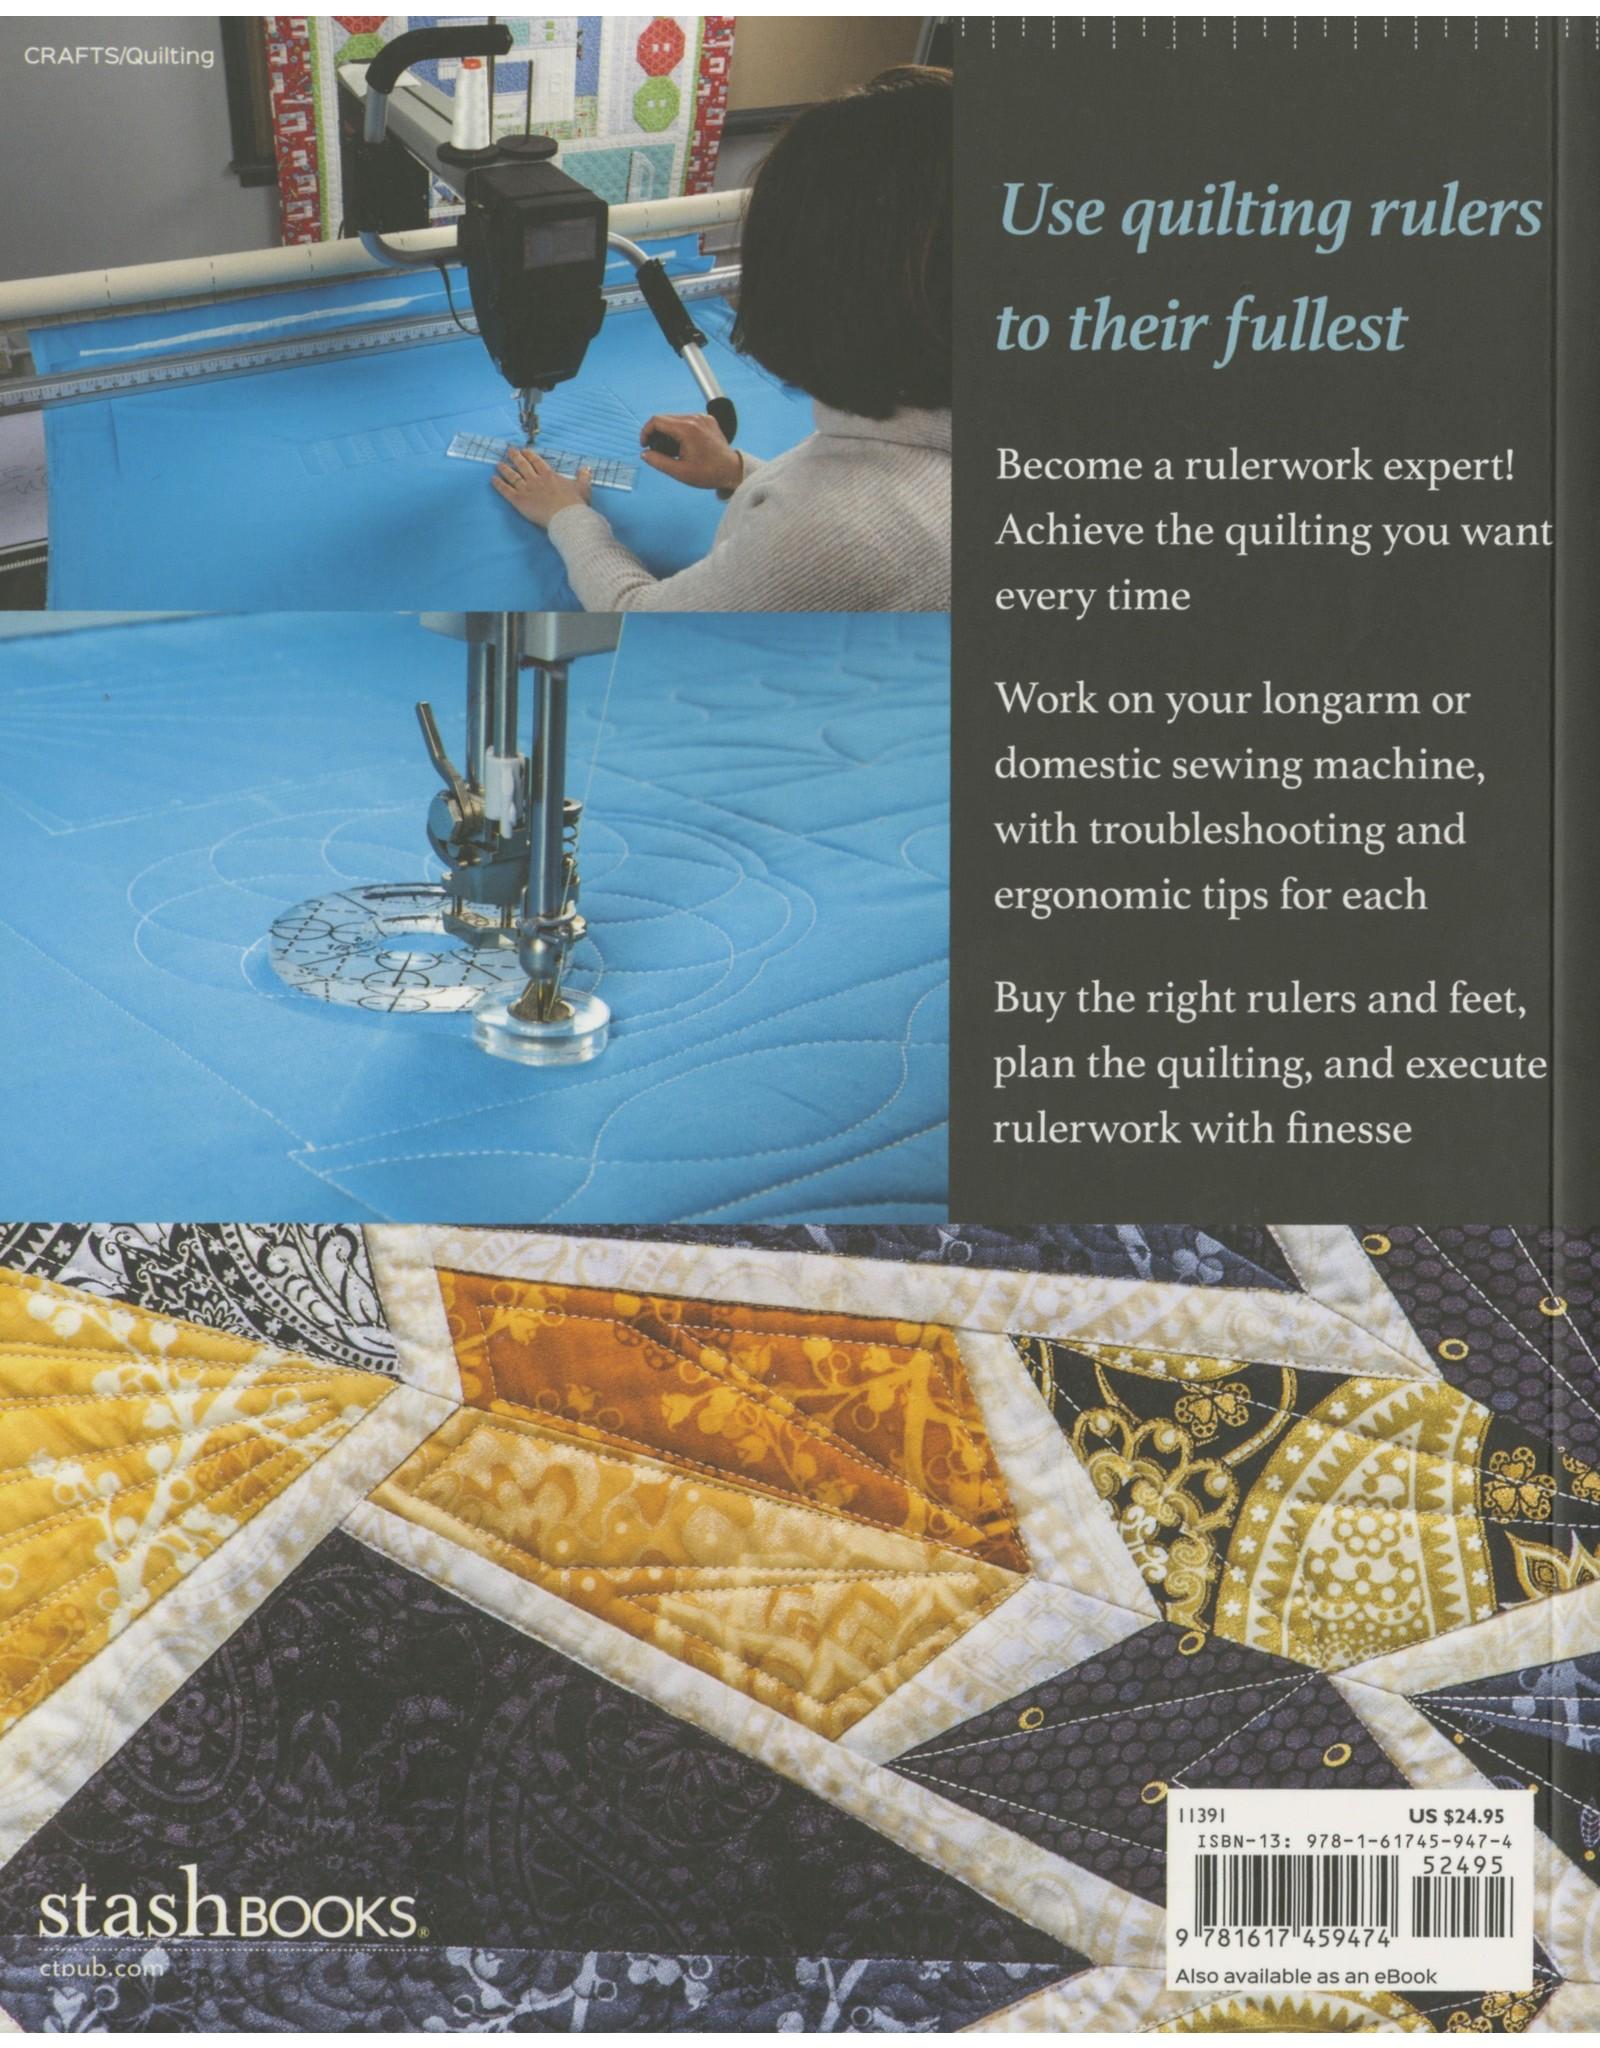 CT Publishing The Ultimate Guide to Rulerwork Quilting - Amanda Murphy